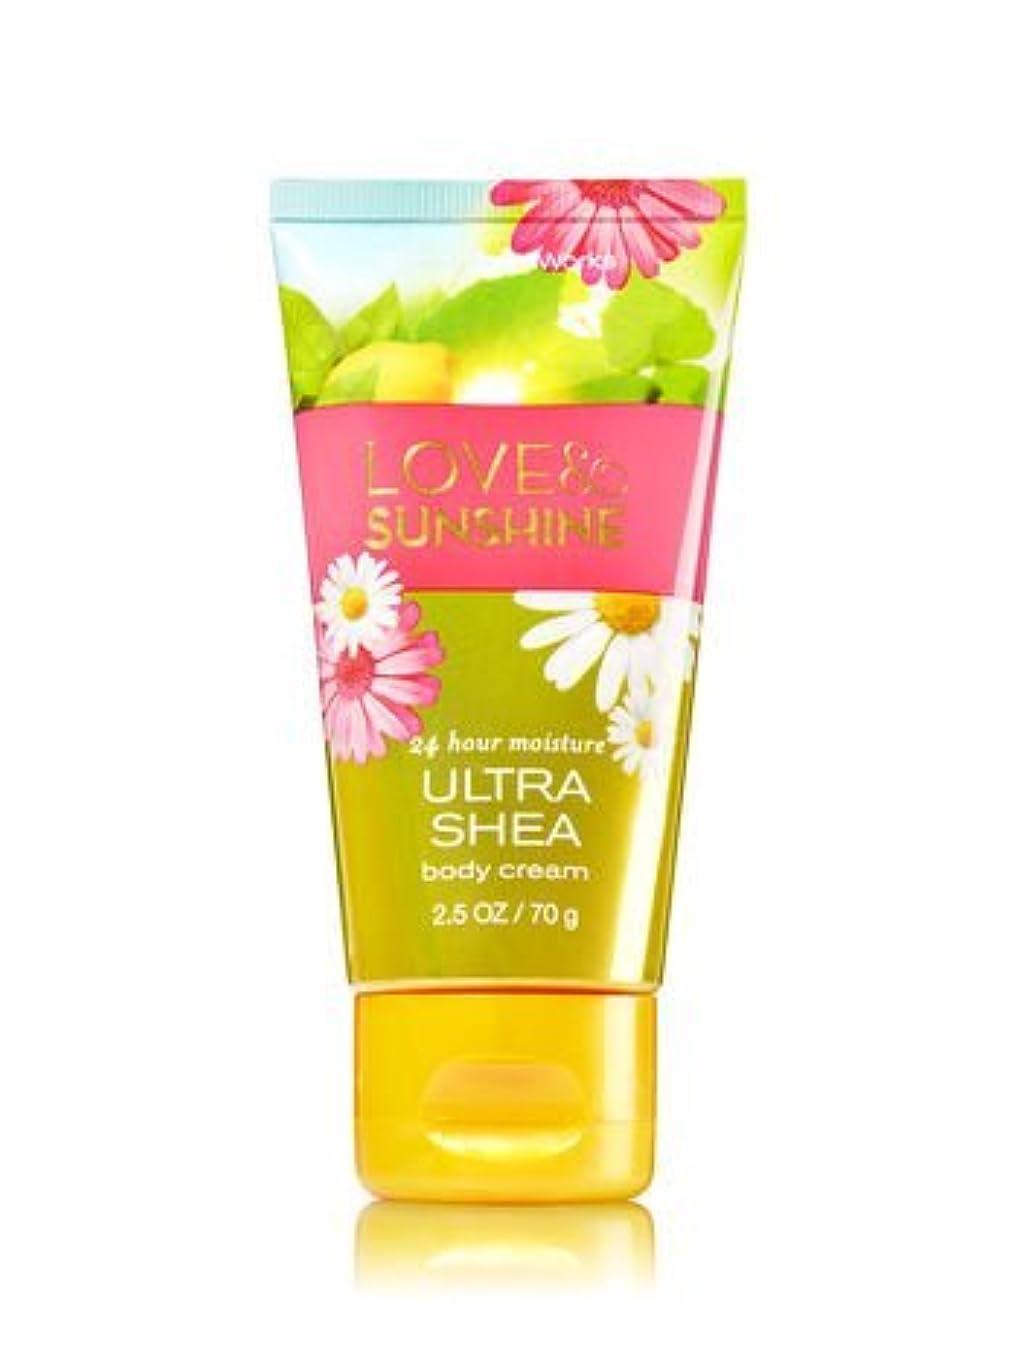 【Bath&Body Works/バス&ボディワークス】 トラベルサイズ ボディクリーム ラブ&サンシャイン Travel Size Body Cream Love & Sunshine 2.5 oz / 70 g [並行輸入品]